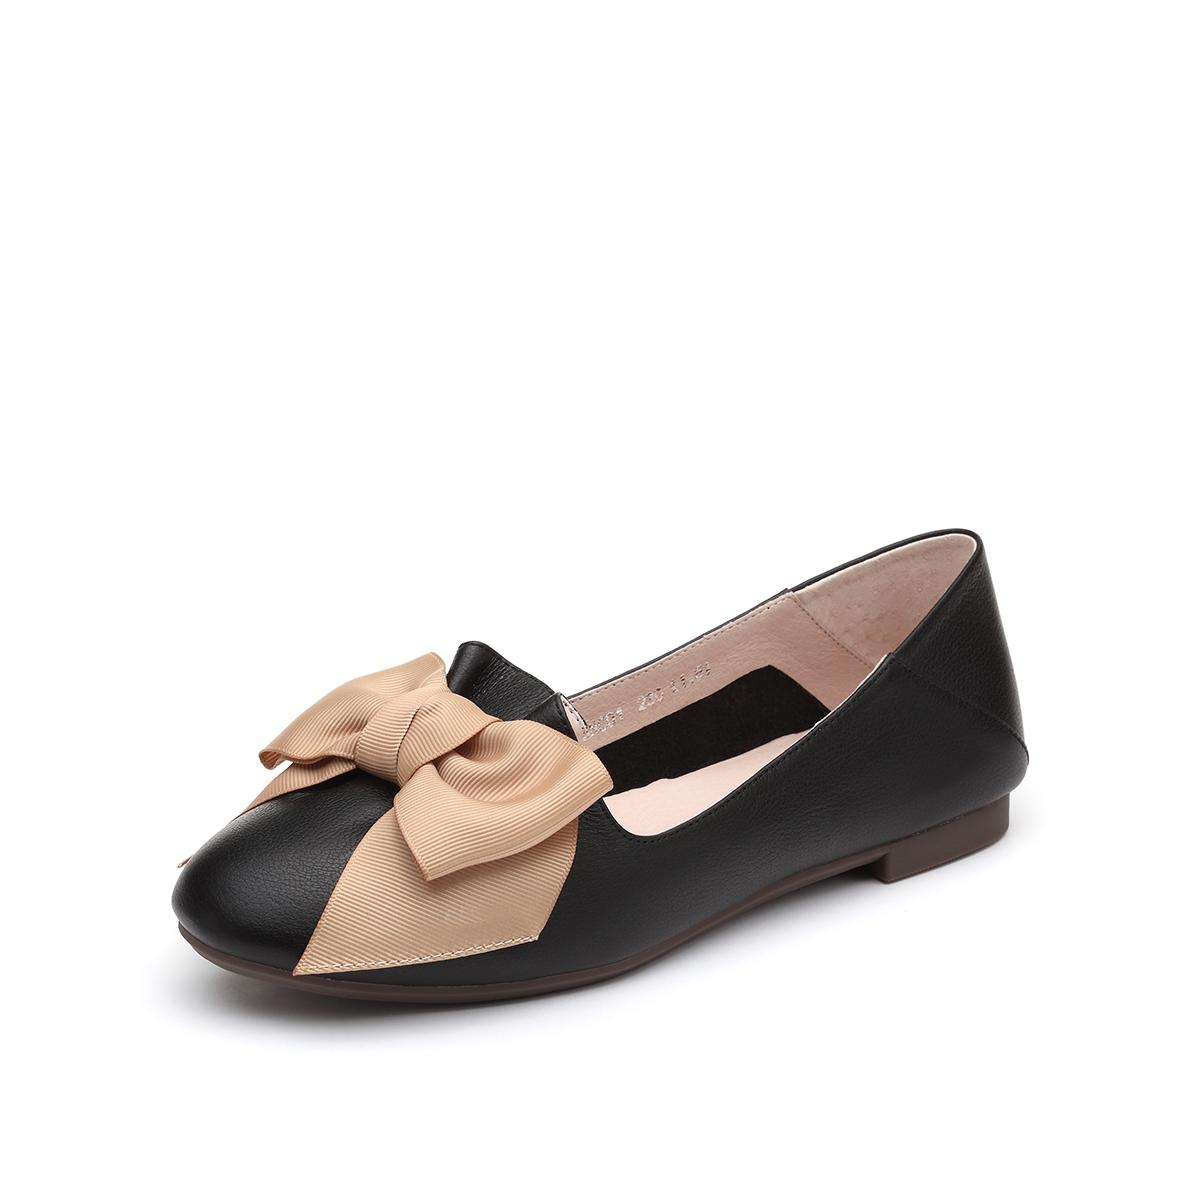 SENDA 森达 VCE3NC01DU1CQ9 女士蝴蝶结平底鞋